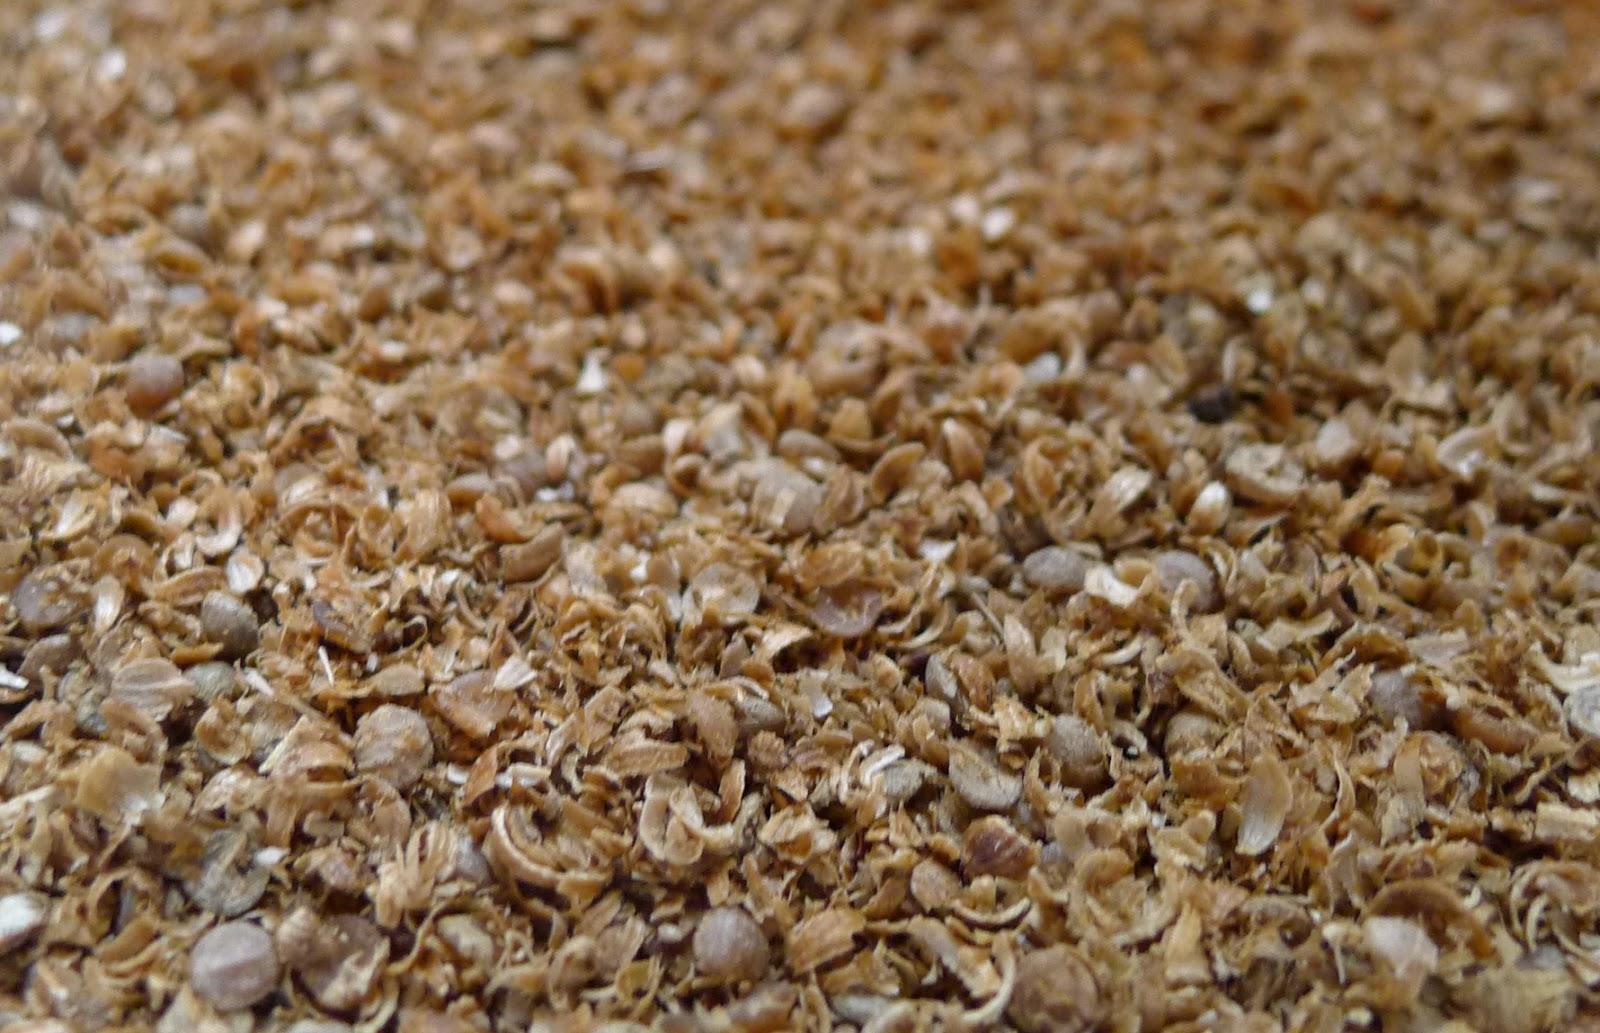 Ground coriander seeds, harvesting seeds